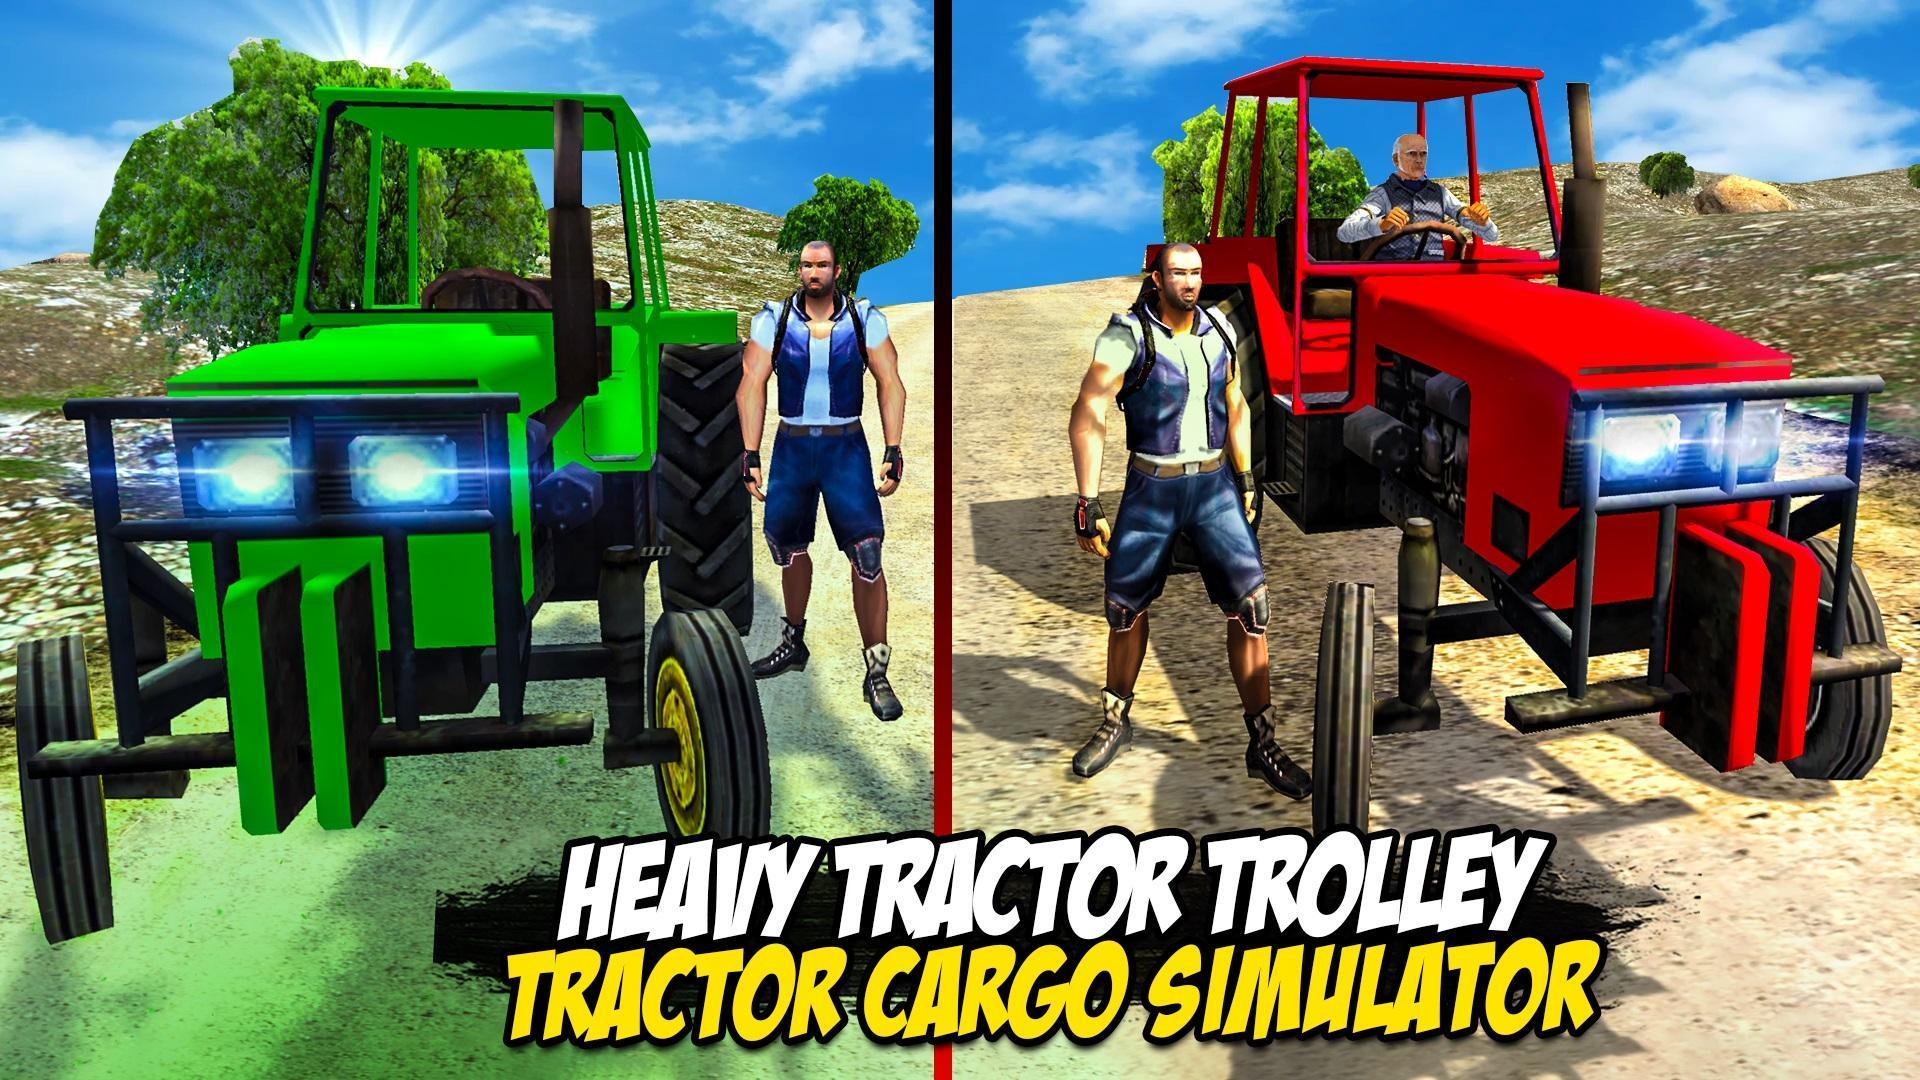 Heavy Tractor Trolley: Tractor Cargo Simulator🚜🚜 3.1 Screenshot 17